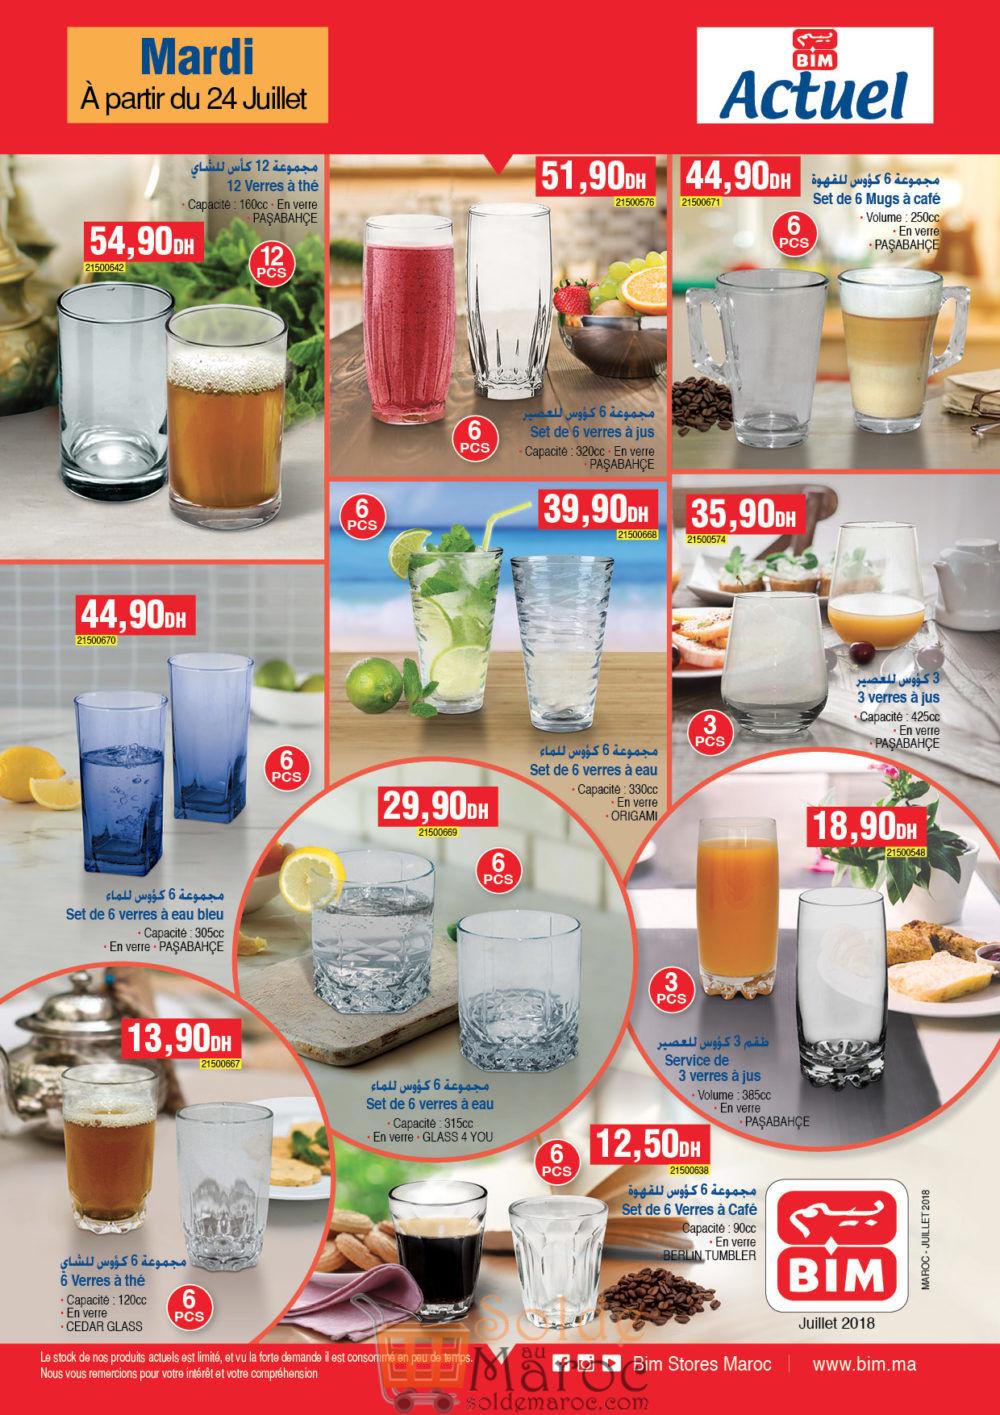 Catalogue Bim Maroc du Mardi 24 Juillet 2018